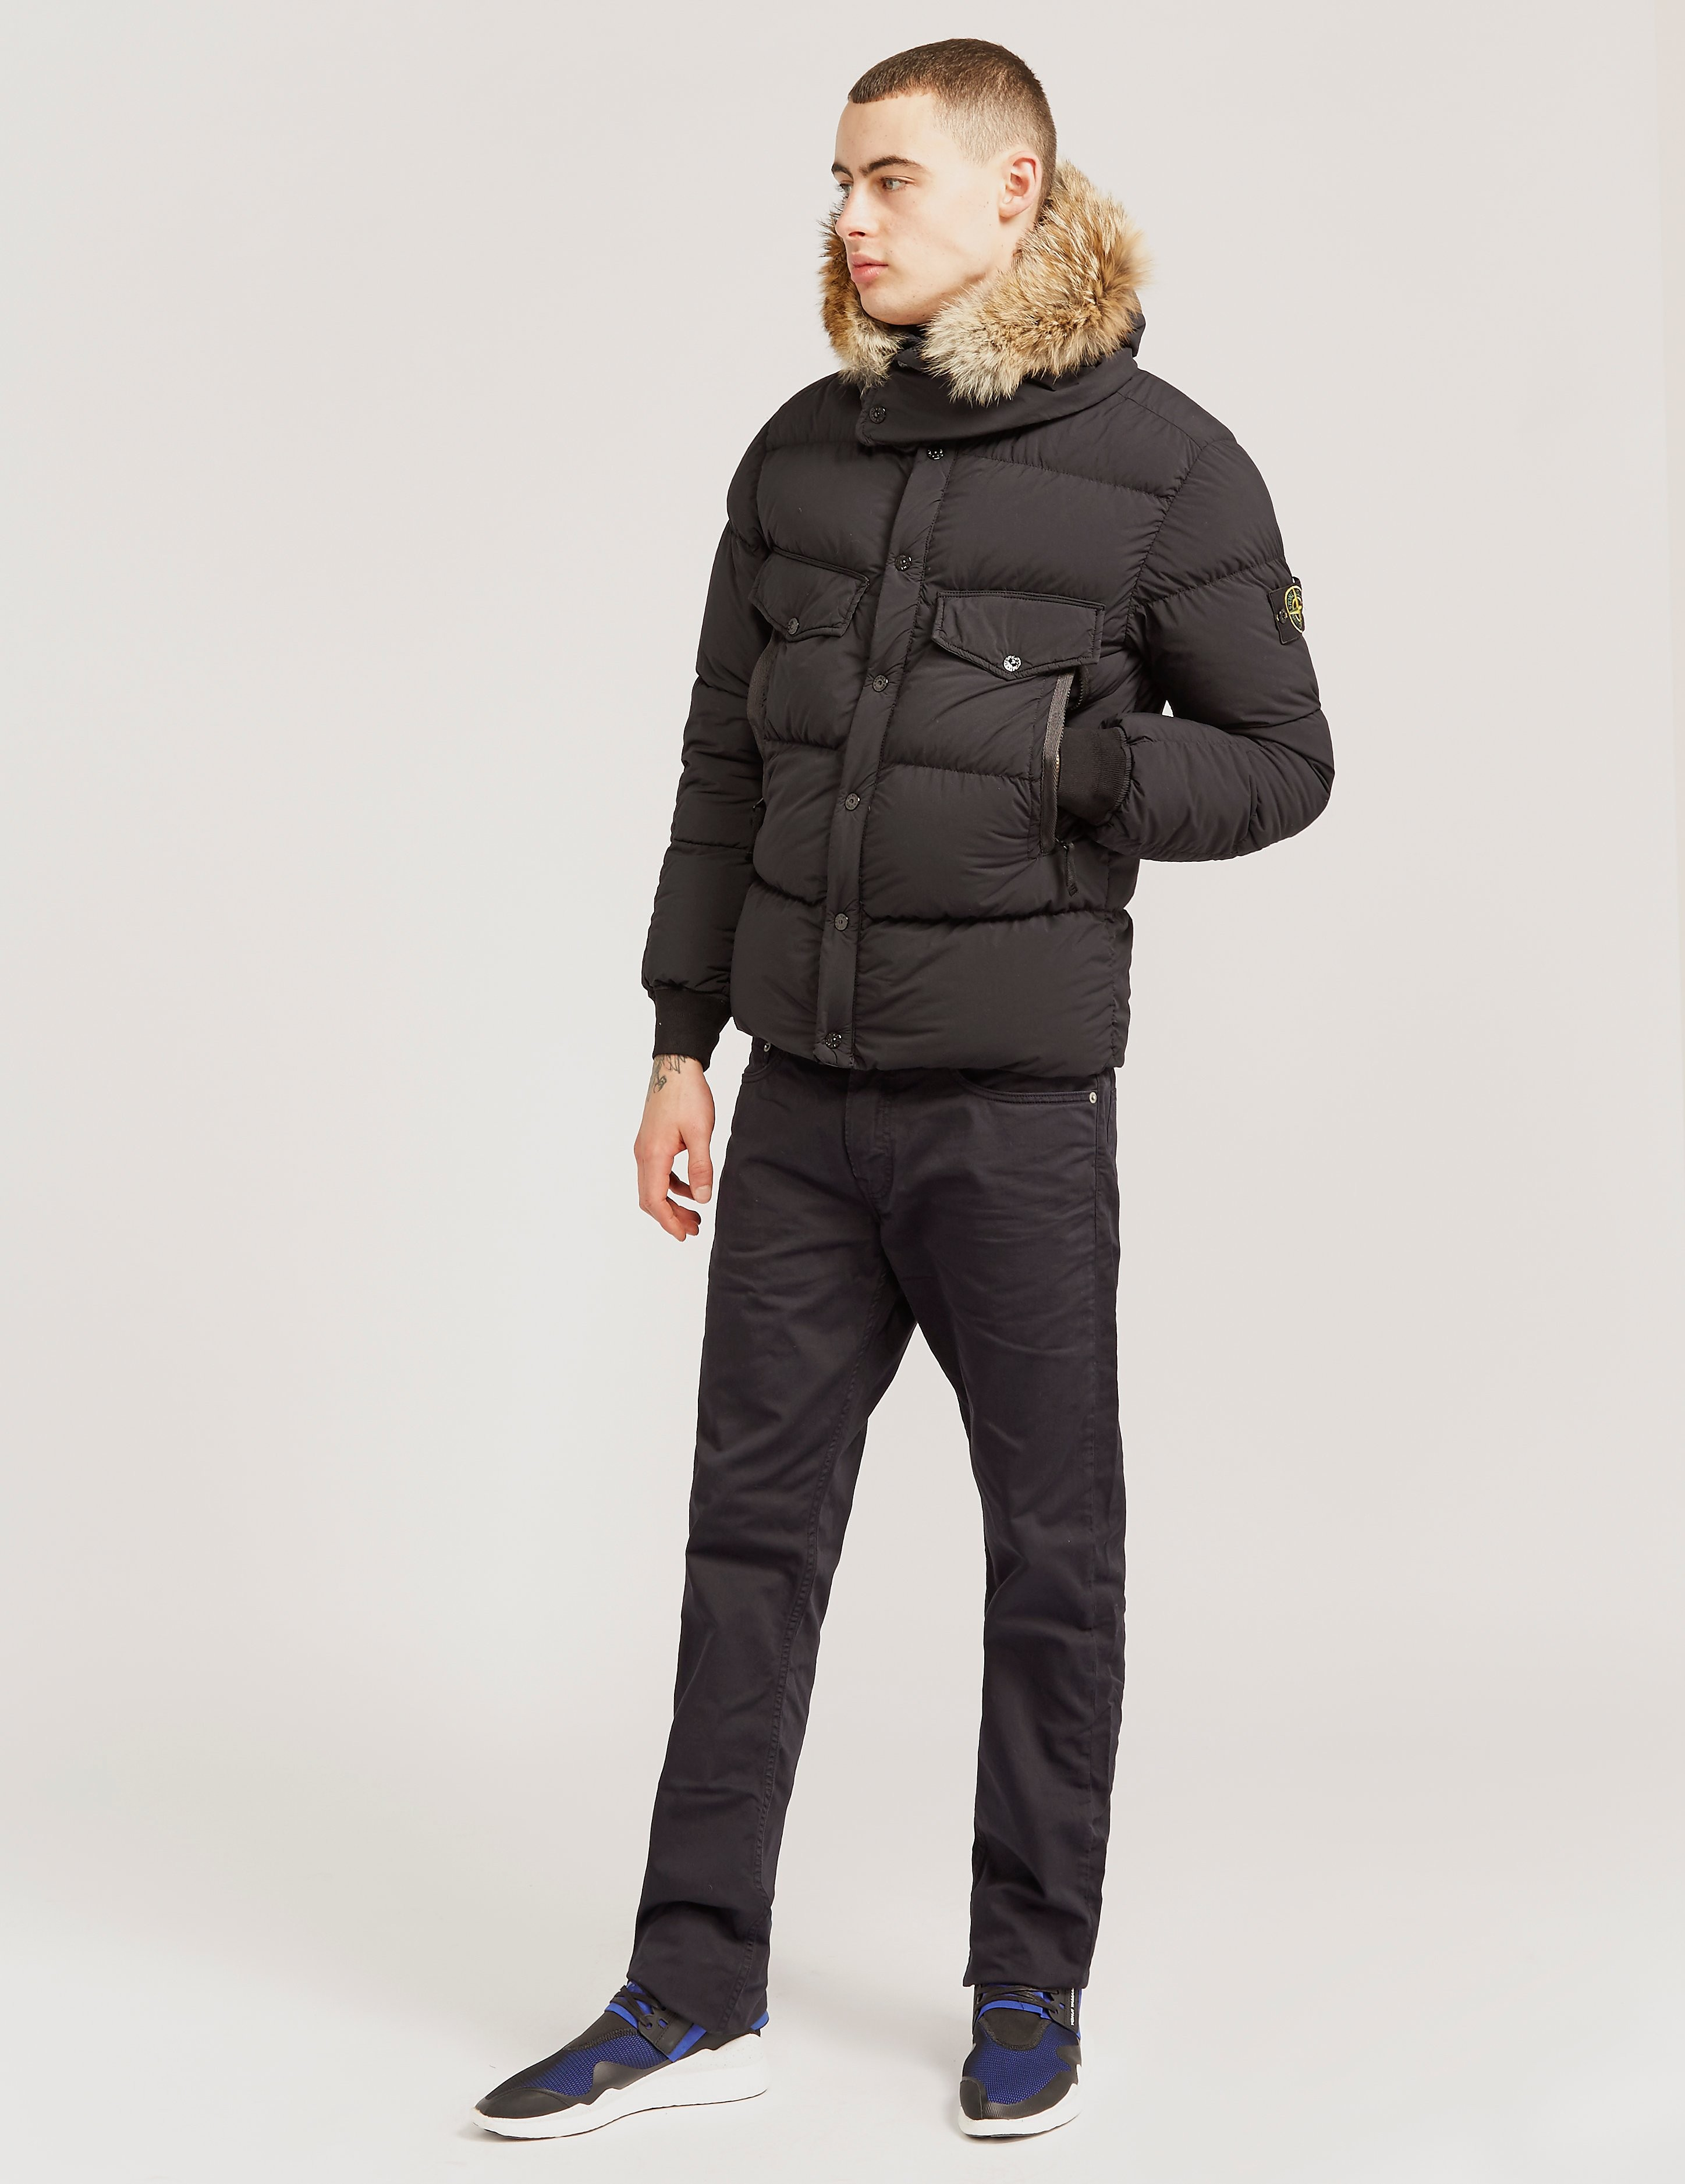 Stone Island Wax Fur Parka Jacket